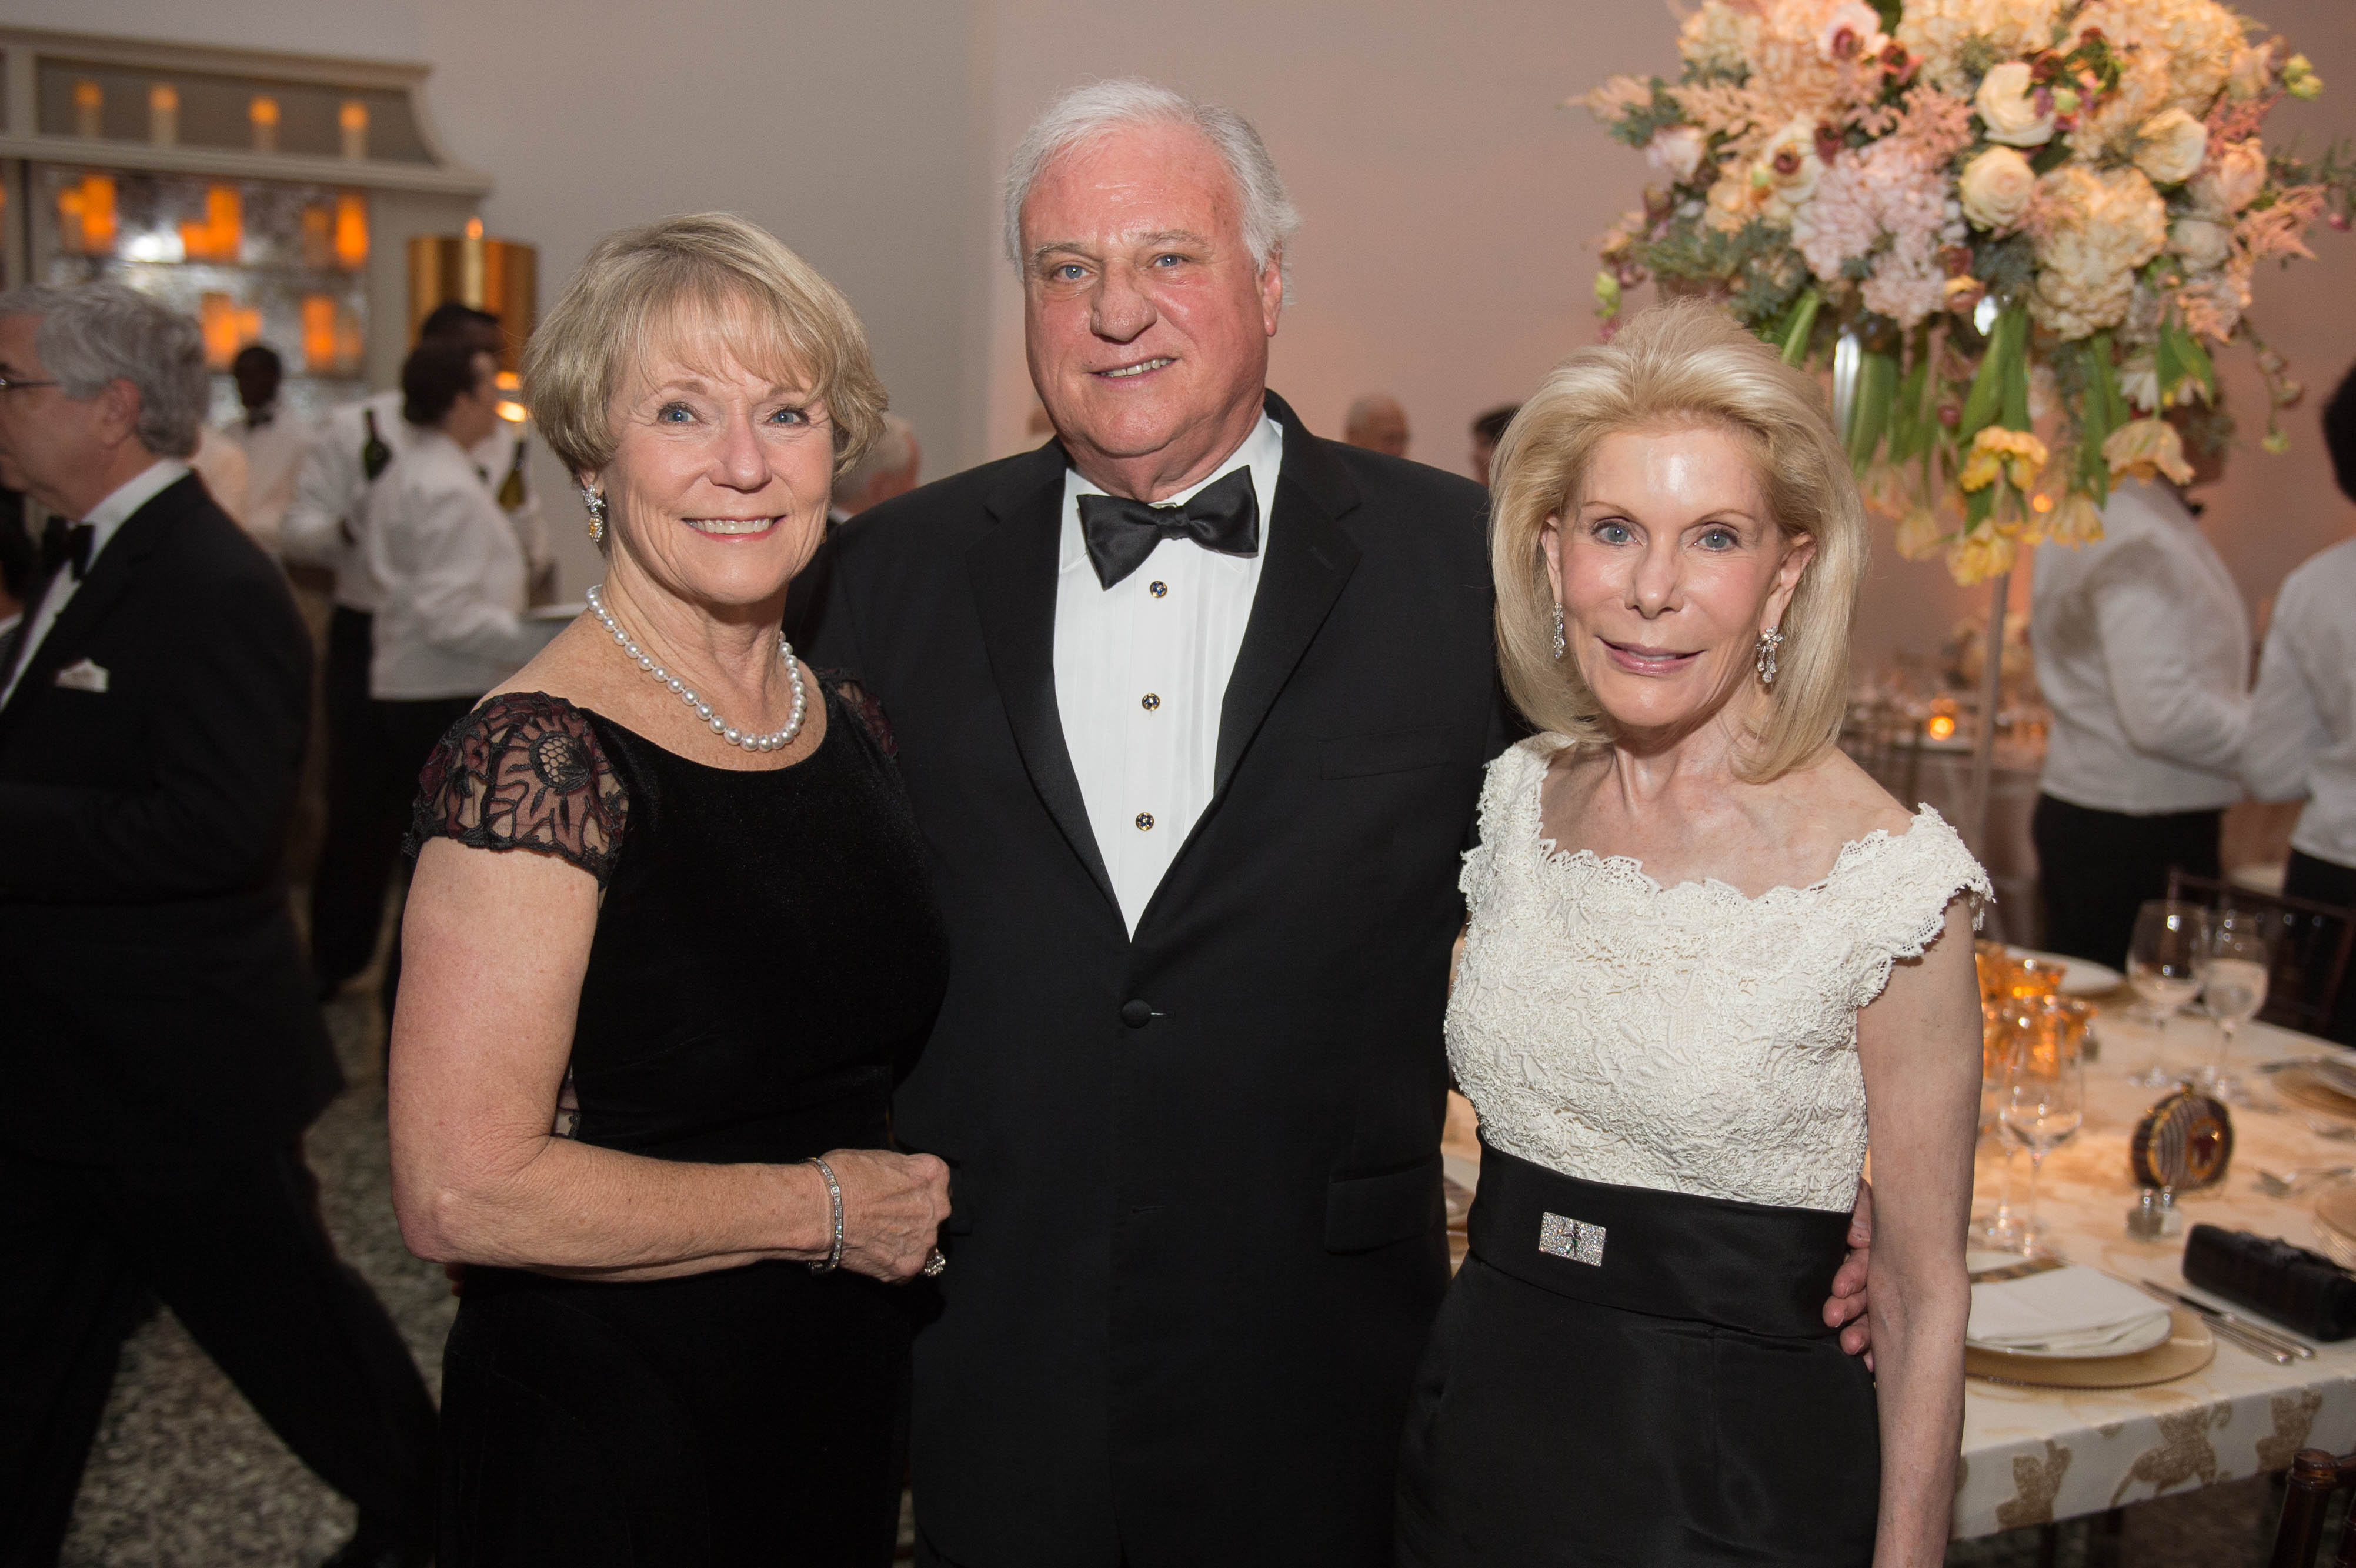 Lela and Robin Gibbs; Frances Marzio; Photo by Wilson Parish